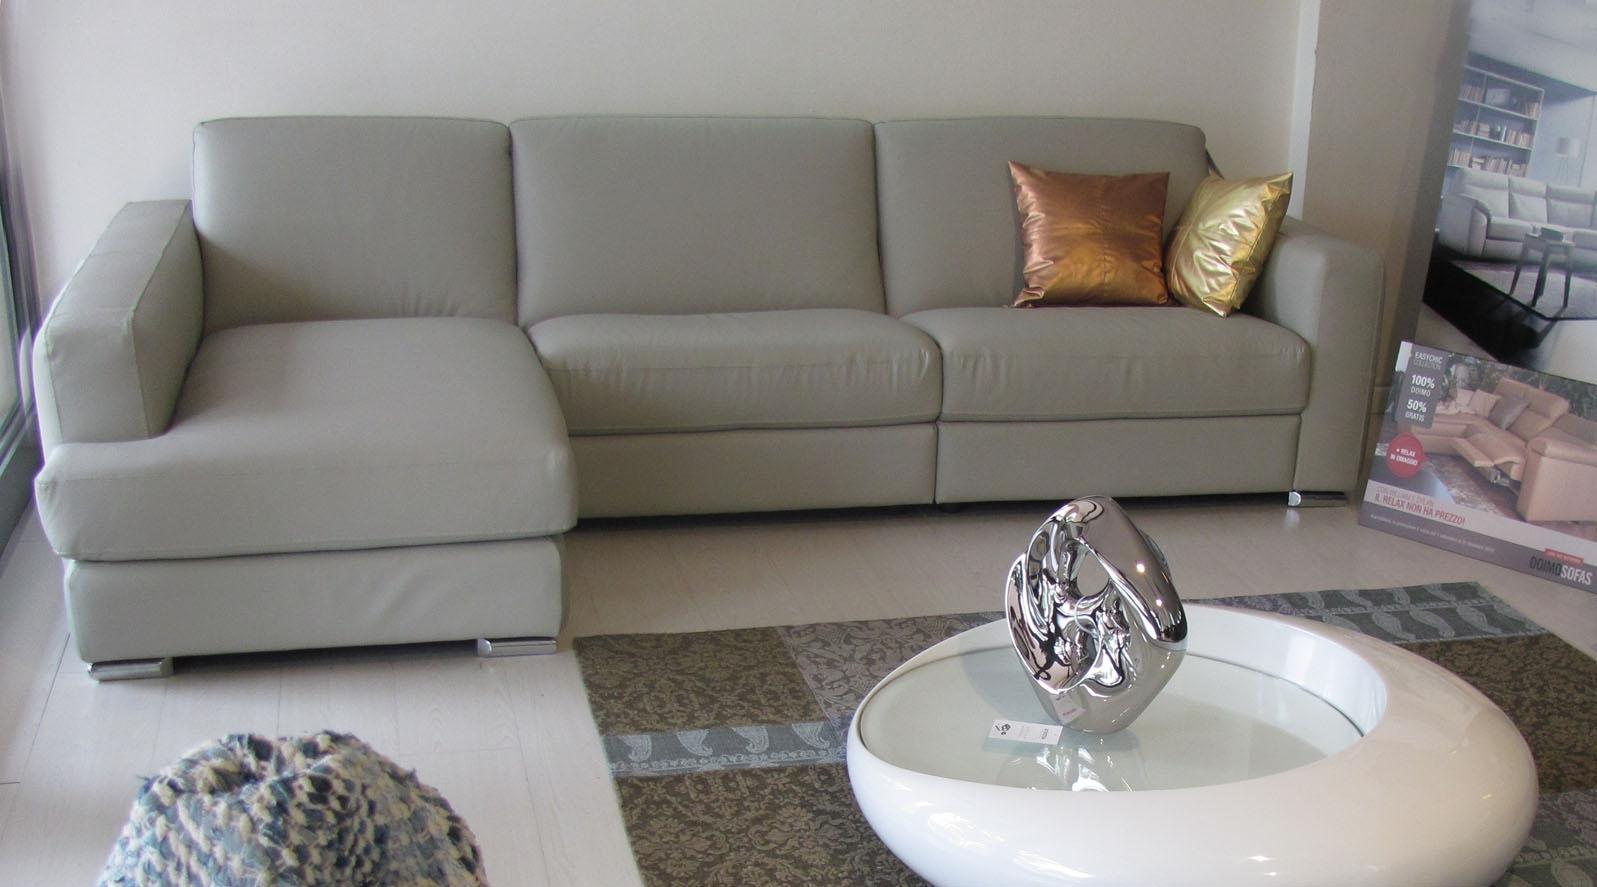 Divano doimo sofas scontato 17910 divani a prezzi scontati - Doimo sofas prezzi ...